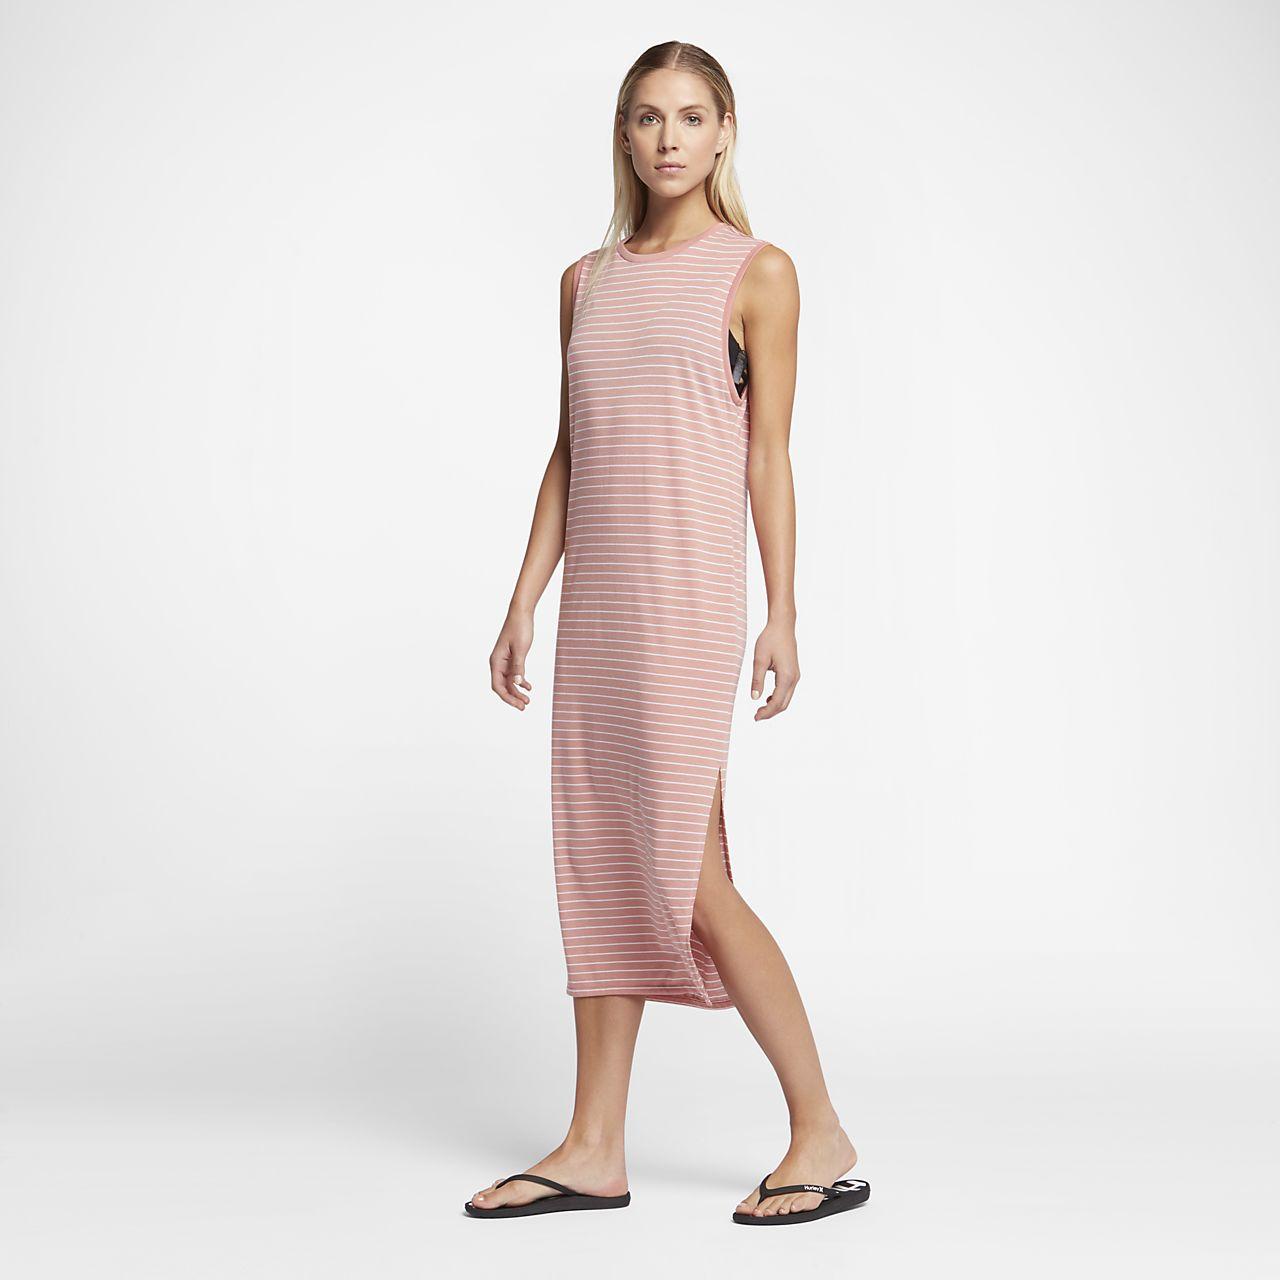 Women dress image